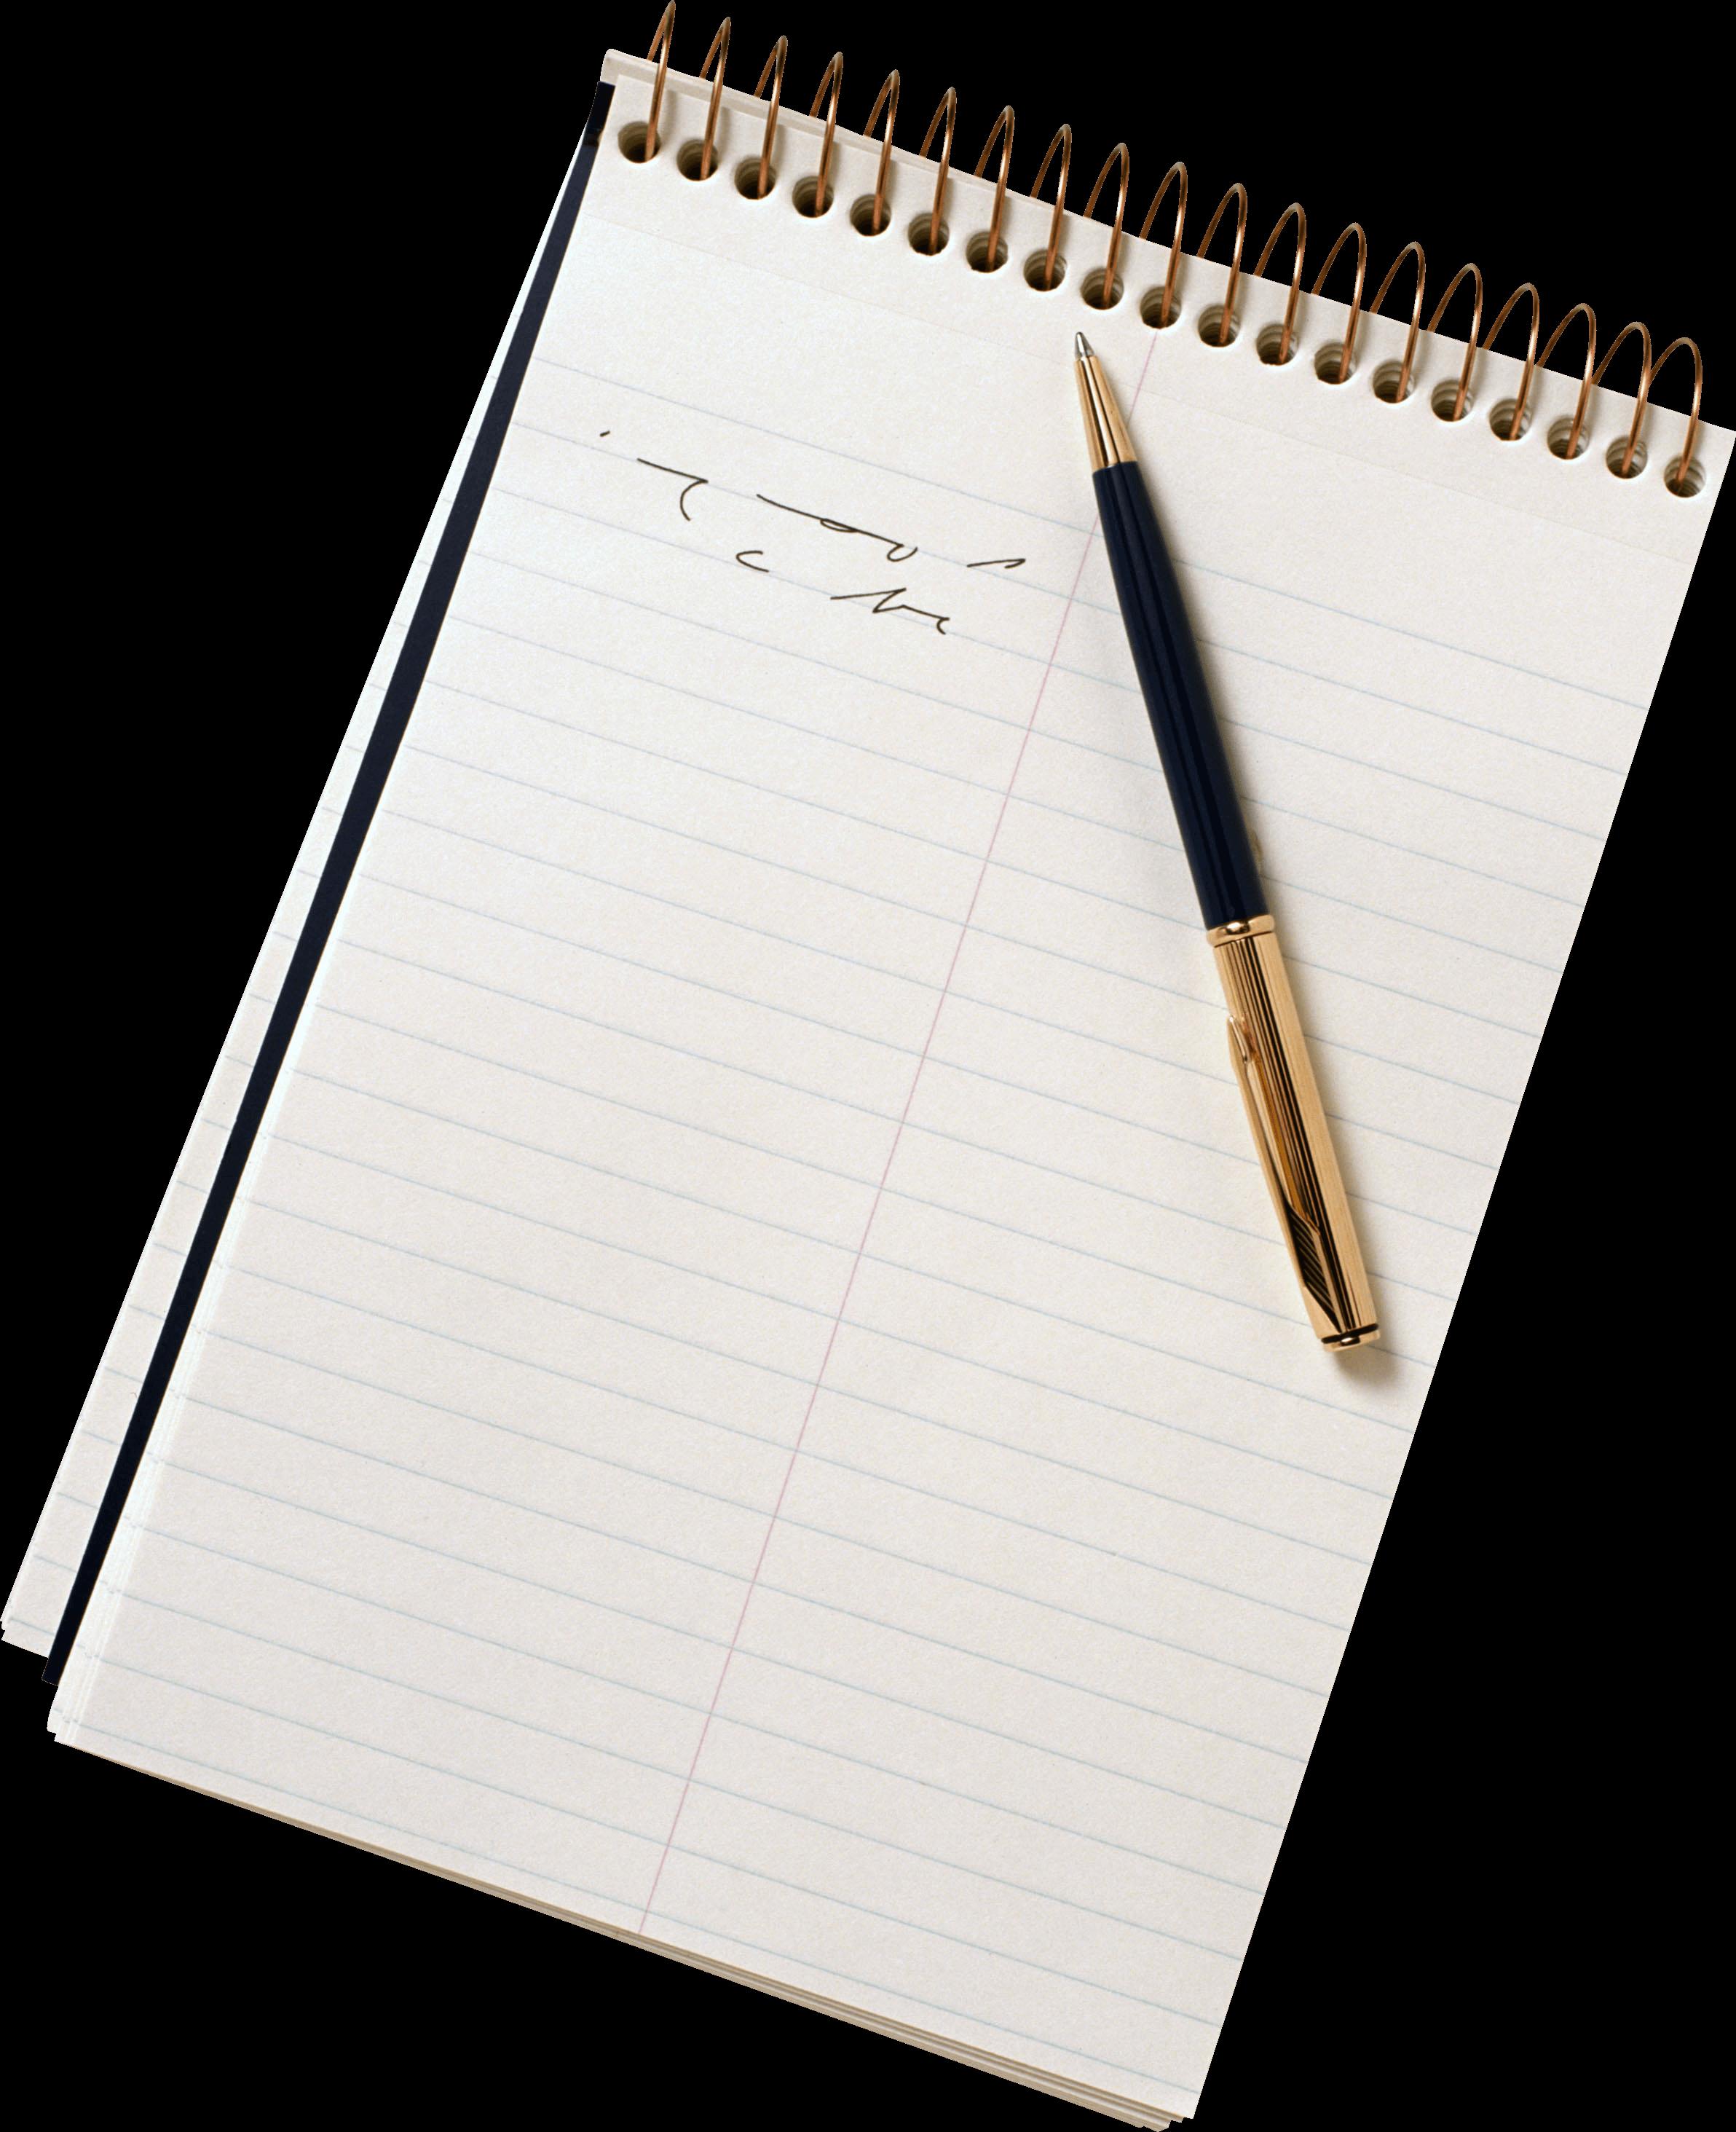 Scroll paper landscape transparent. Notebook clipart notebook pen